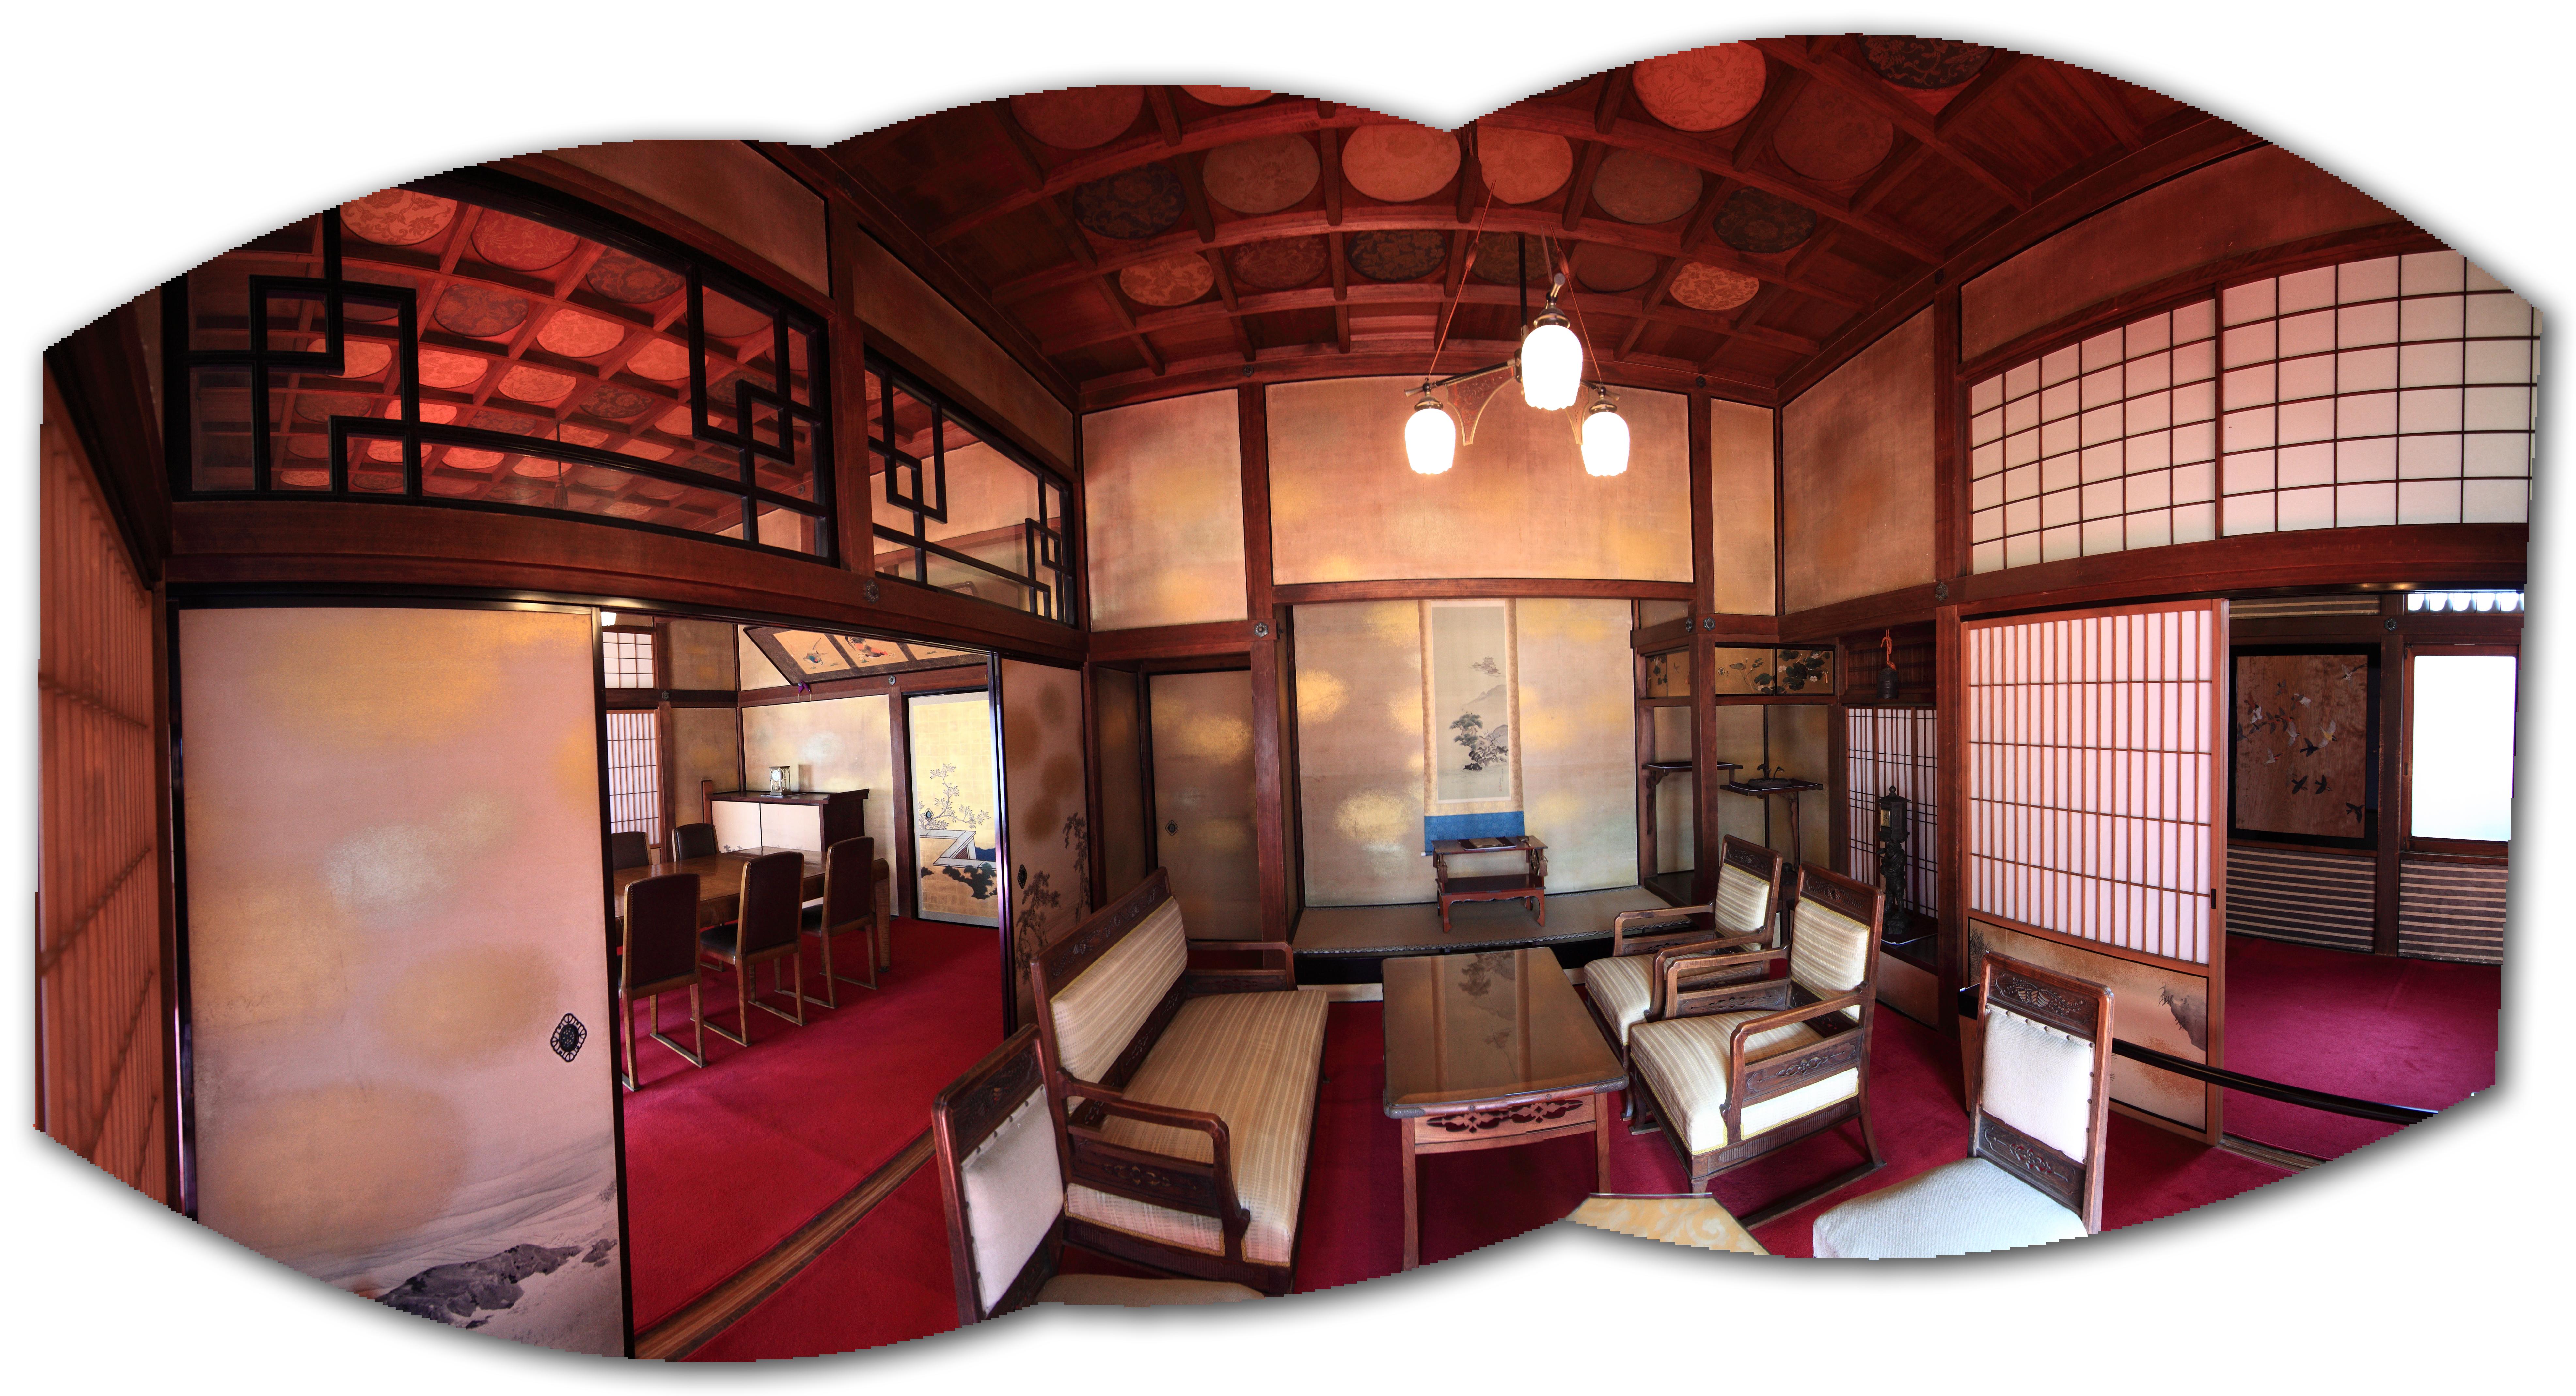 Japanese Traditonal Inspired House Interior Design Ideas